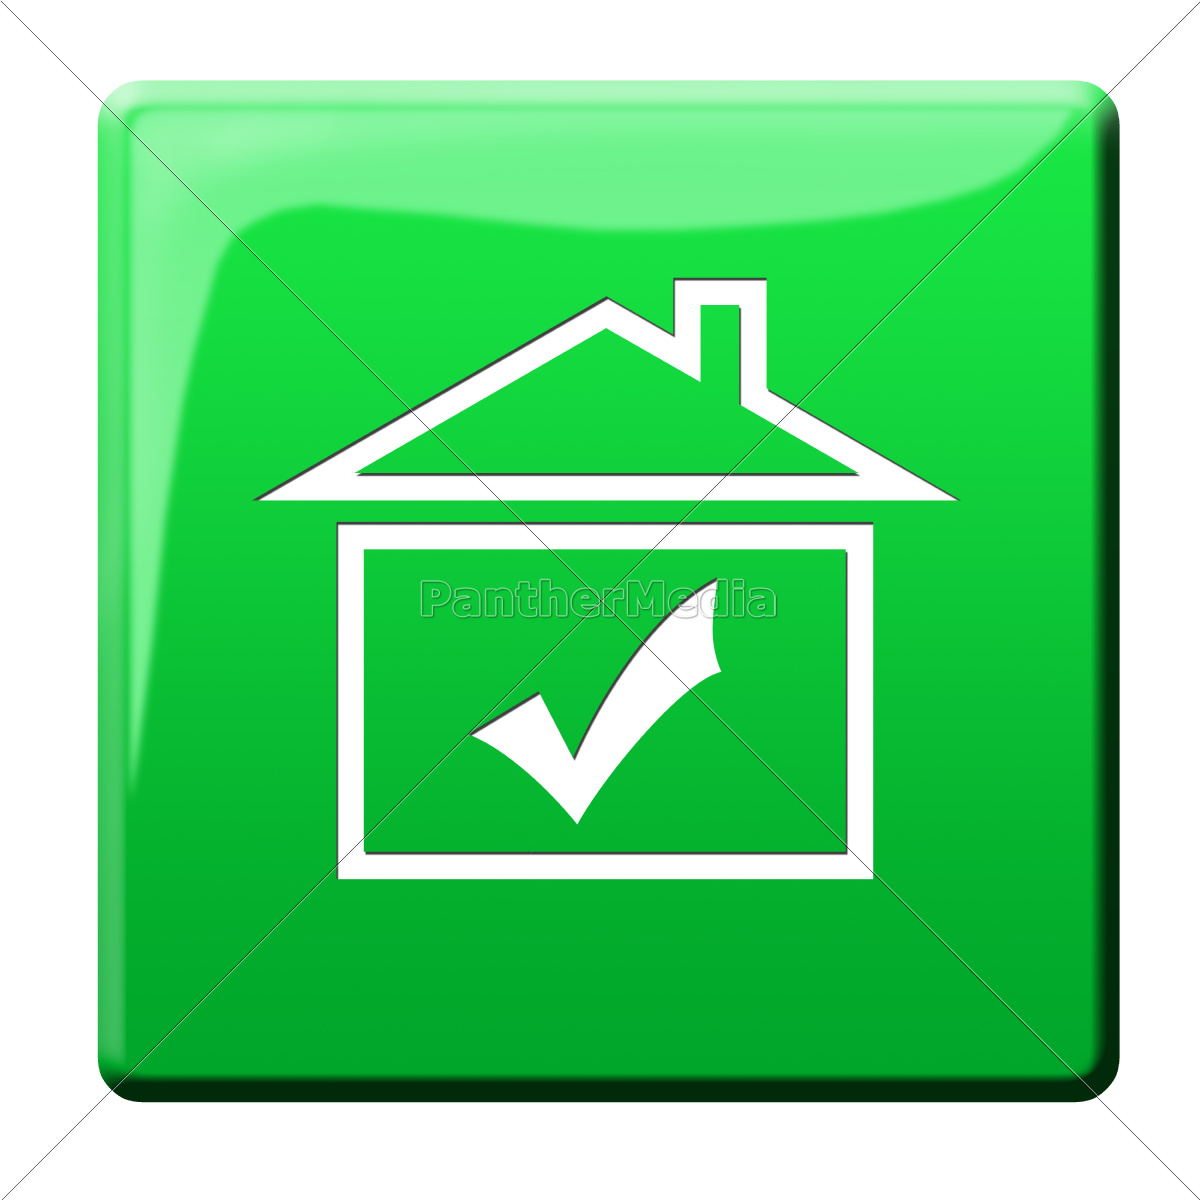 haus symbol icon lizenzfreies bild 10119427. Black Bedroom Furniture Sets. Home Design Ideas